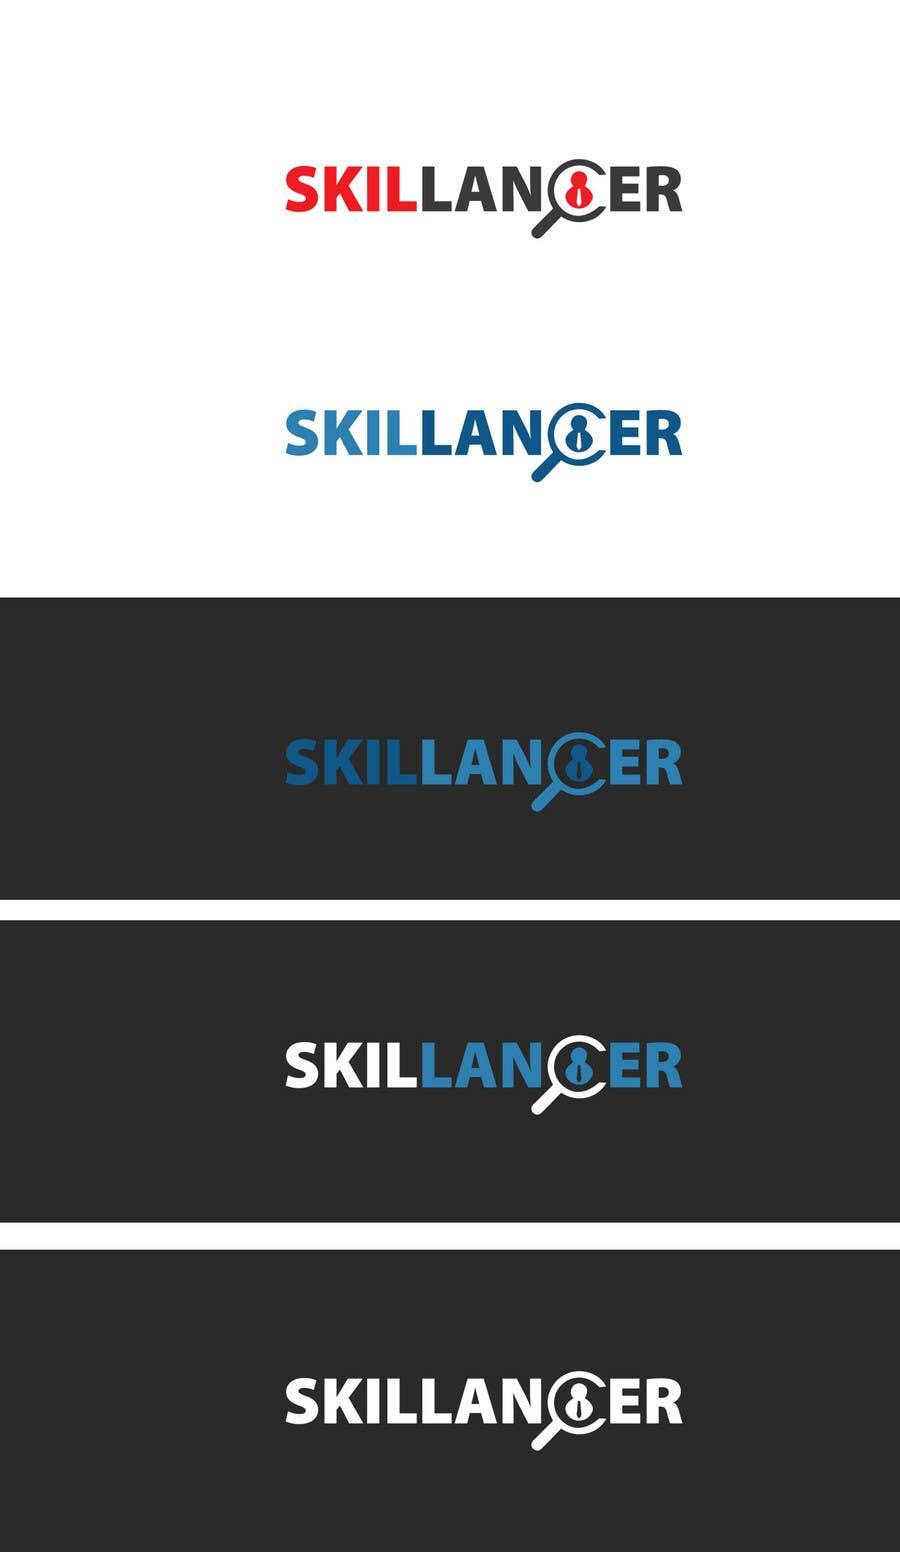 Kilpailutyö #4 kilpailussa Design a Logo for my Project bidding Website